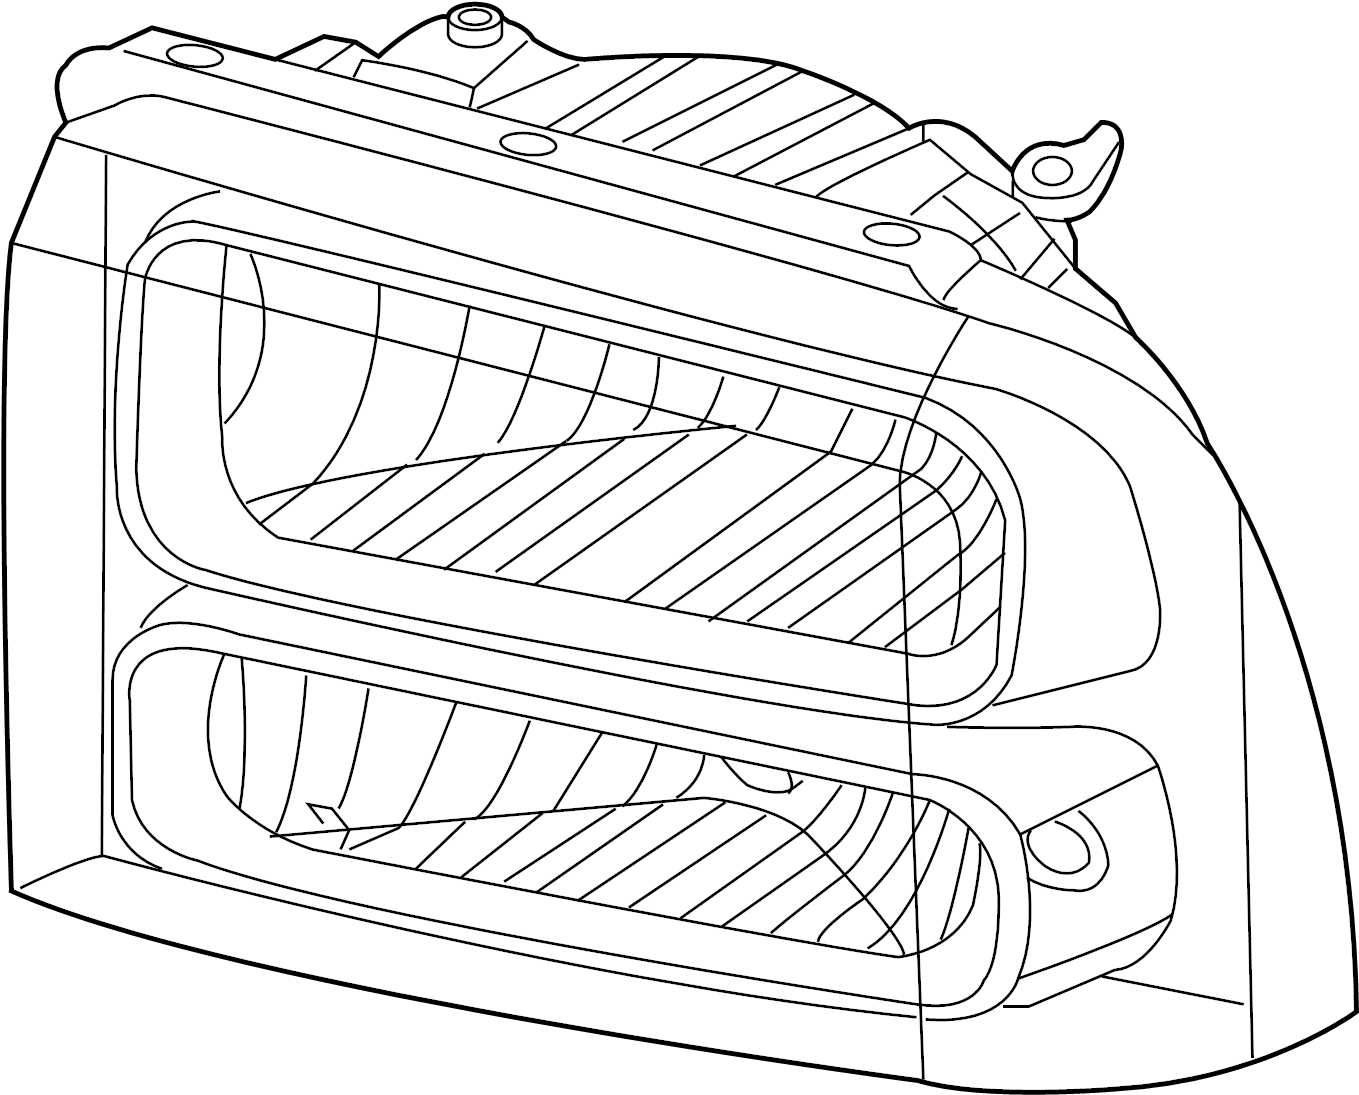 Ford F 350 Super Duty Headlight Right Aero Body